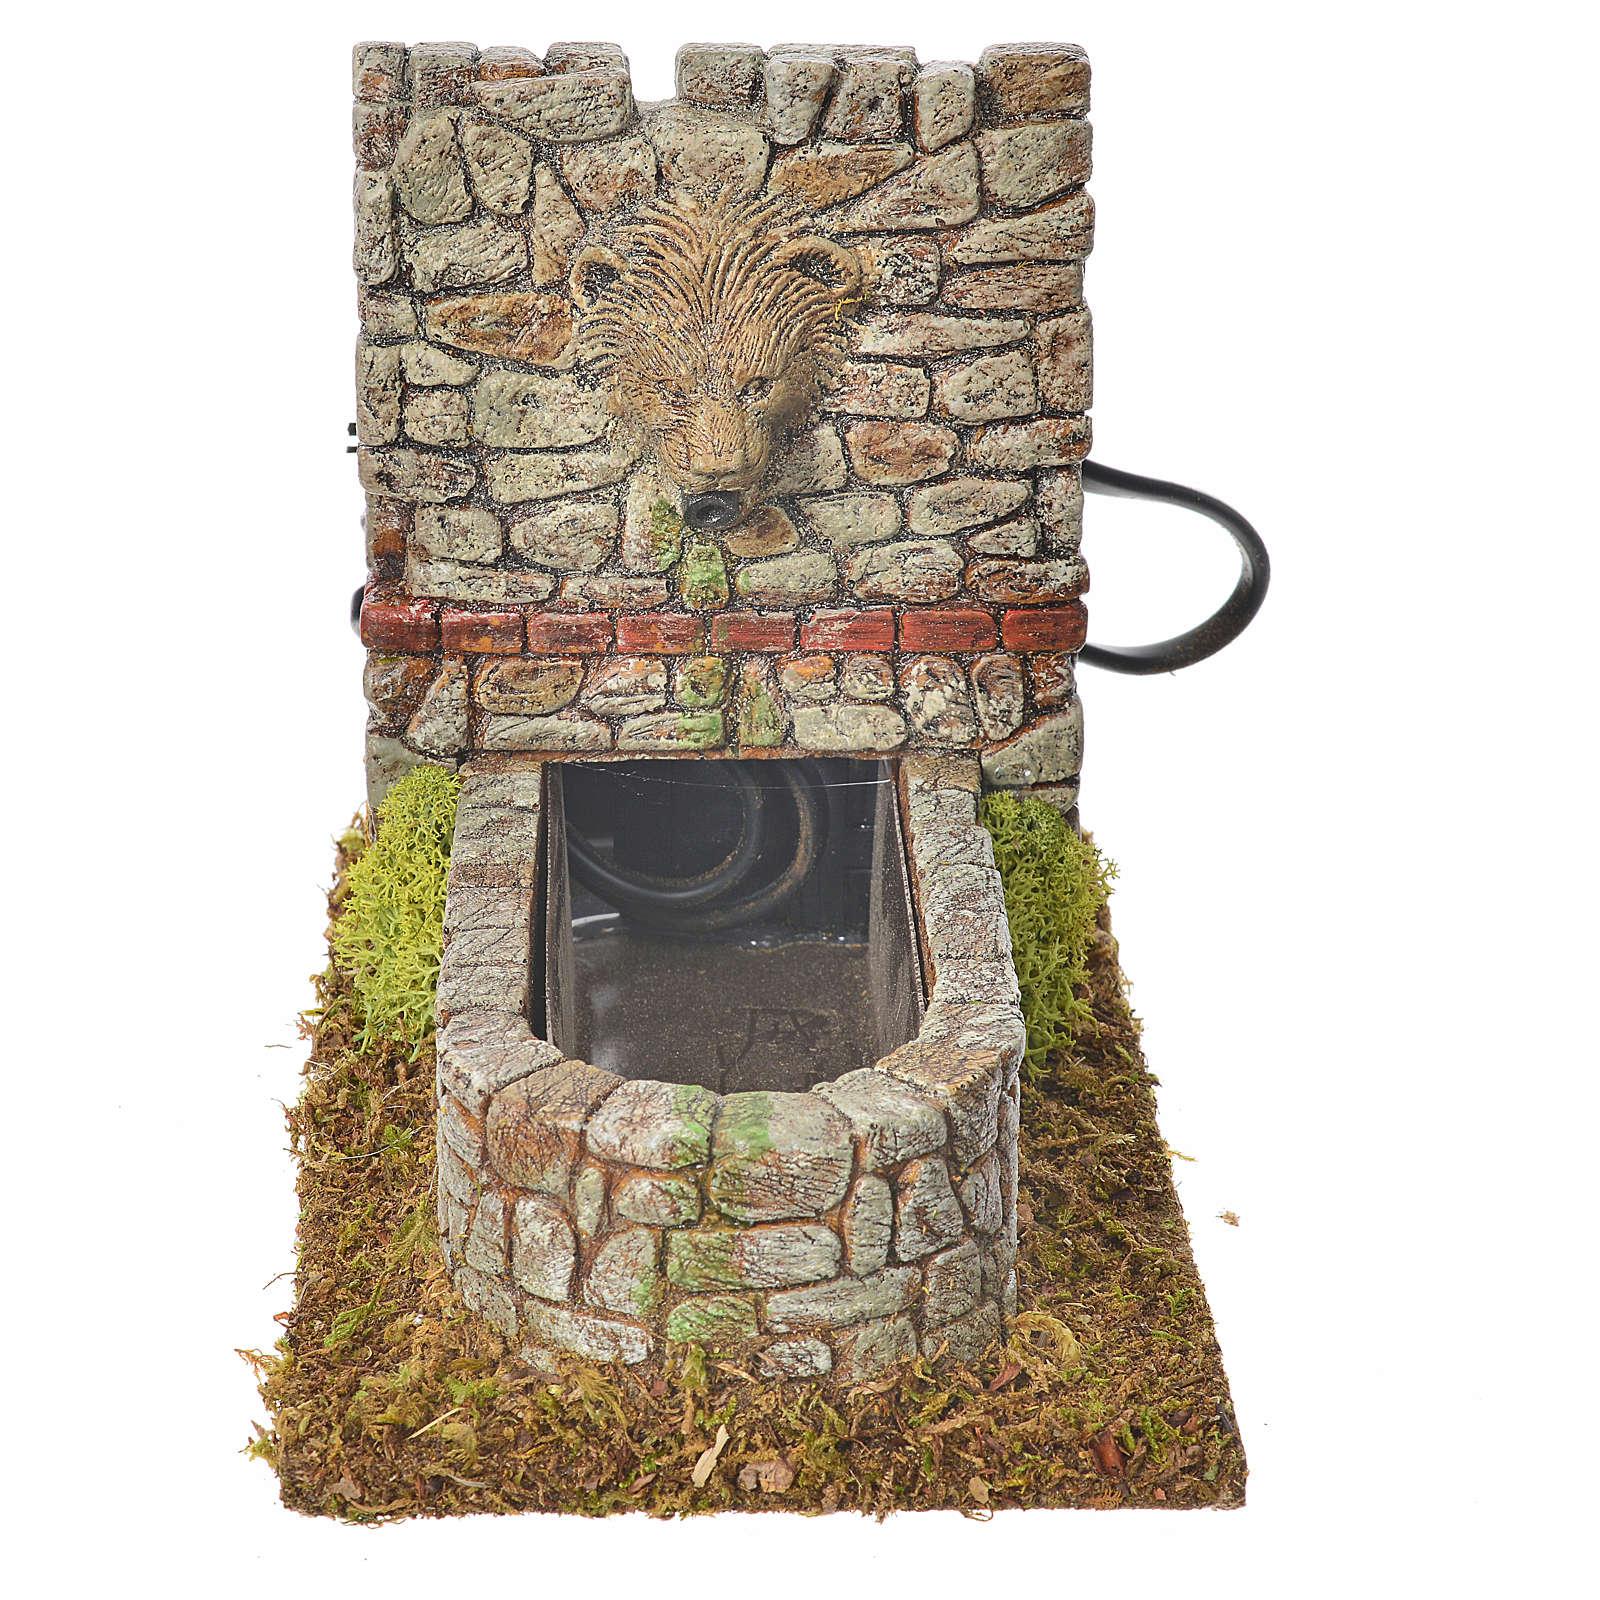 Fontana romana in resina, ambientazione presepe 4